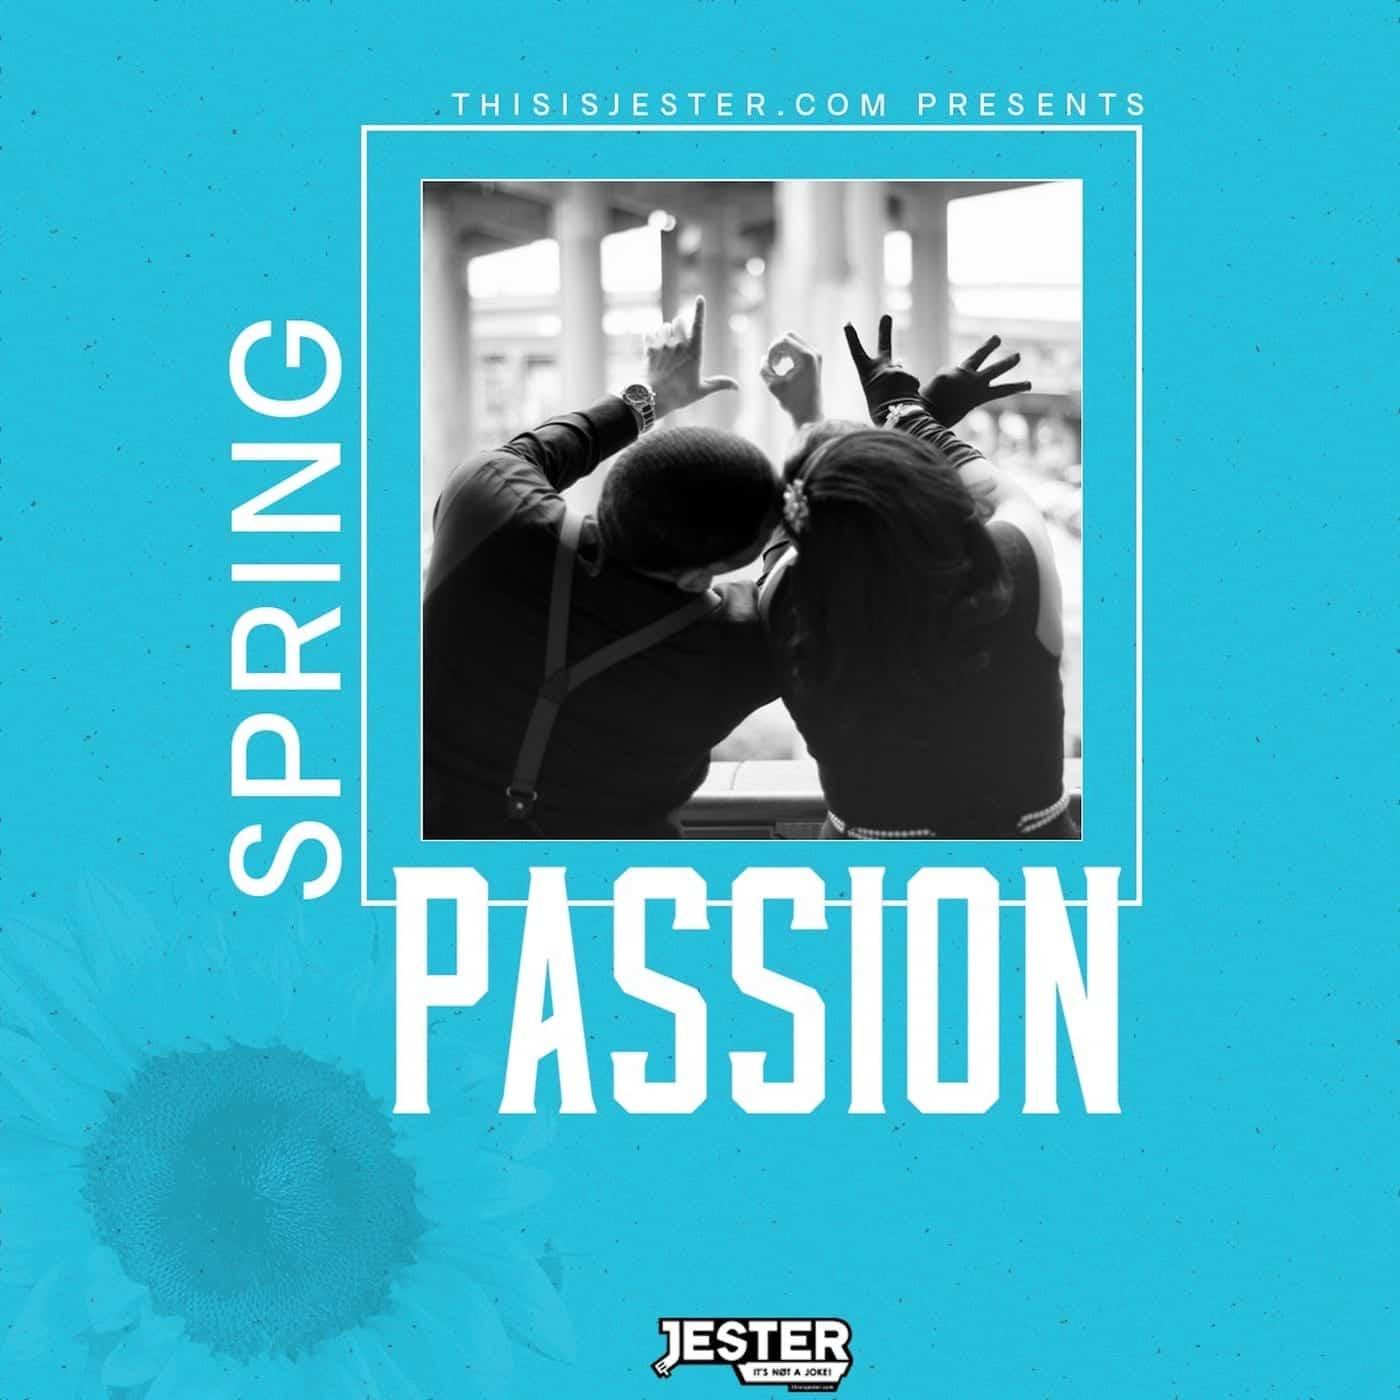 RiddimStream.com & ThisIsJester.com present Spring Passion (The Mix)